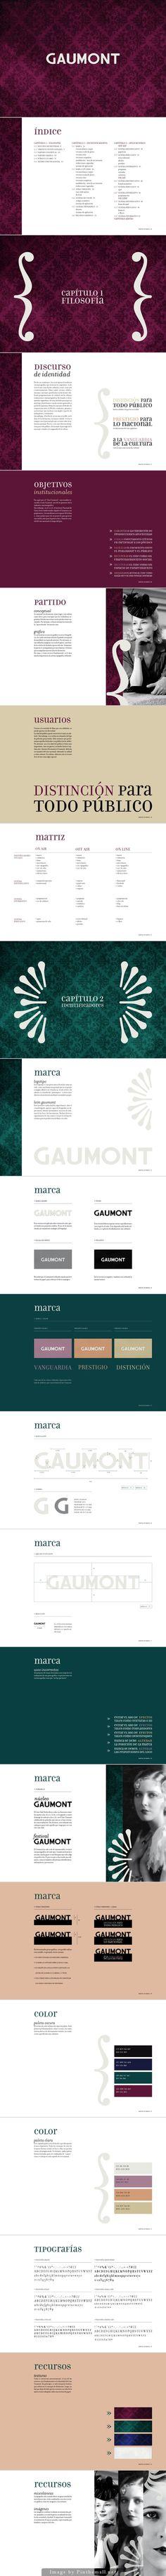 Manual de marca - cine gaumont - florencia bello - https://www.behance.net/gallery/10353443/manual-corporativo